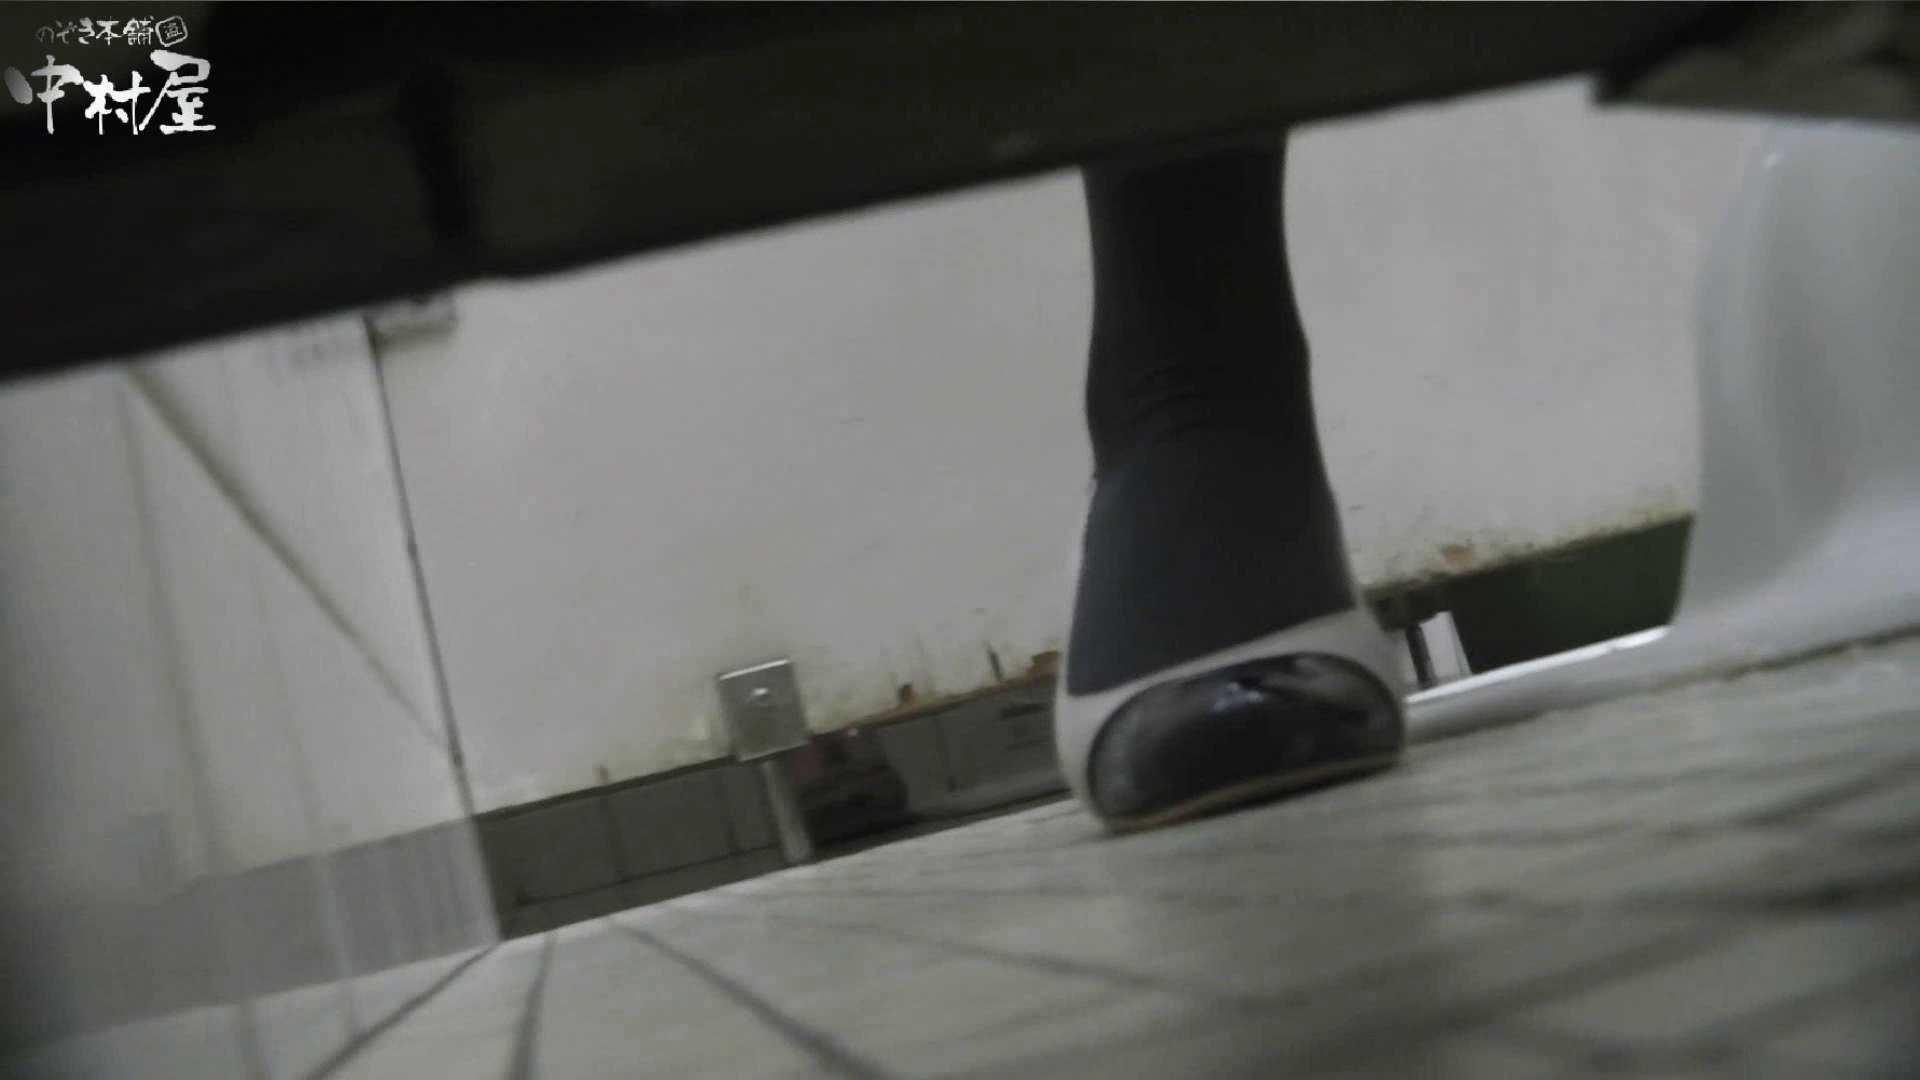 vol.41 命がけ潜伏洗面所! 毛薄め・硬度並・推定250g プライベート ワレメ無修正動画無料 112PIX 95